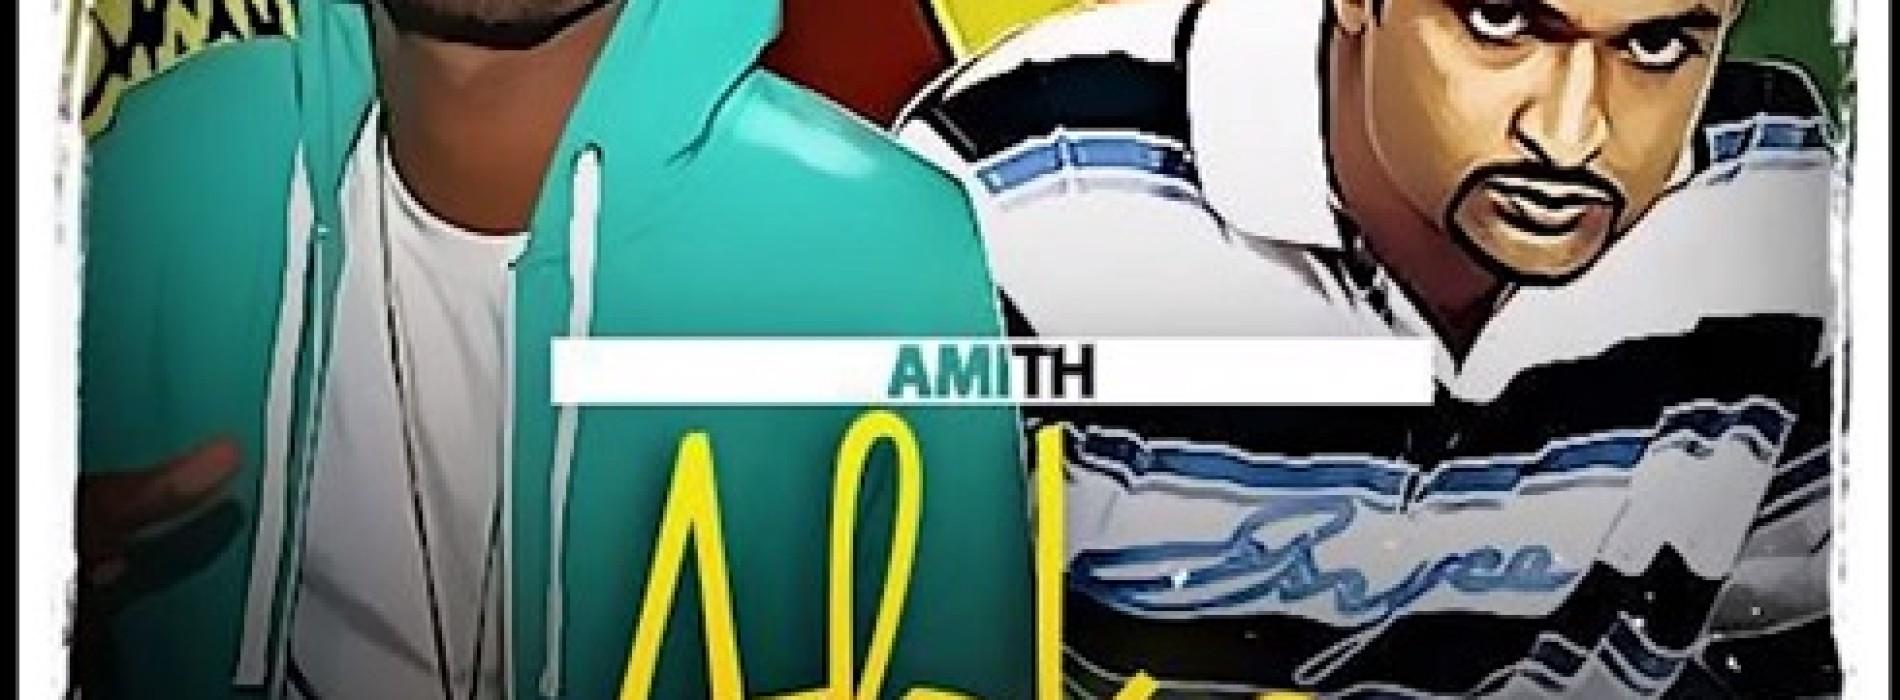 Iraj Ft. Amith – Aloke ( Mix Tape )